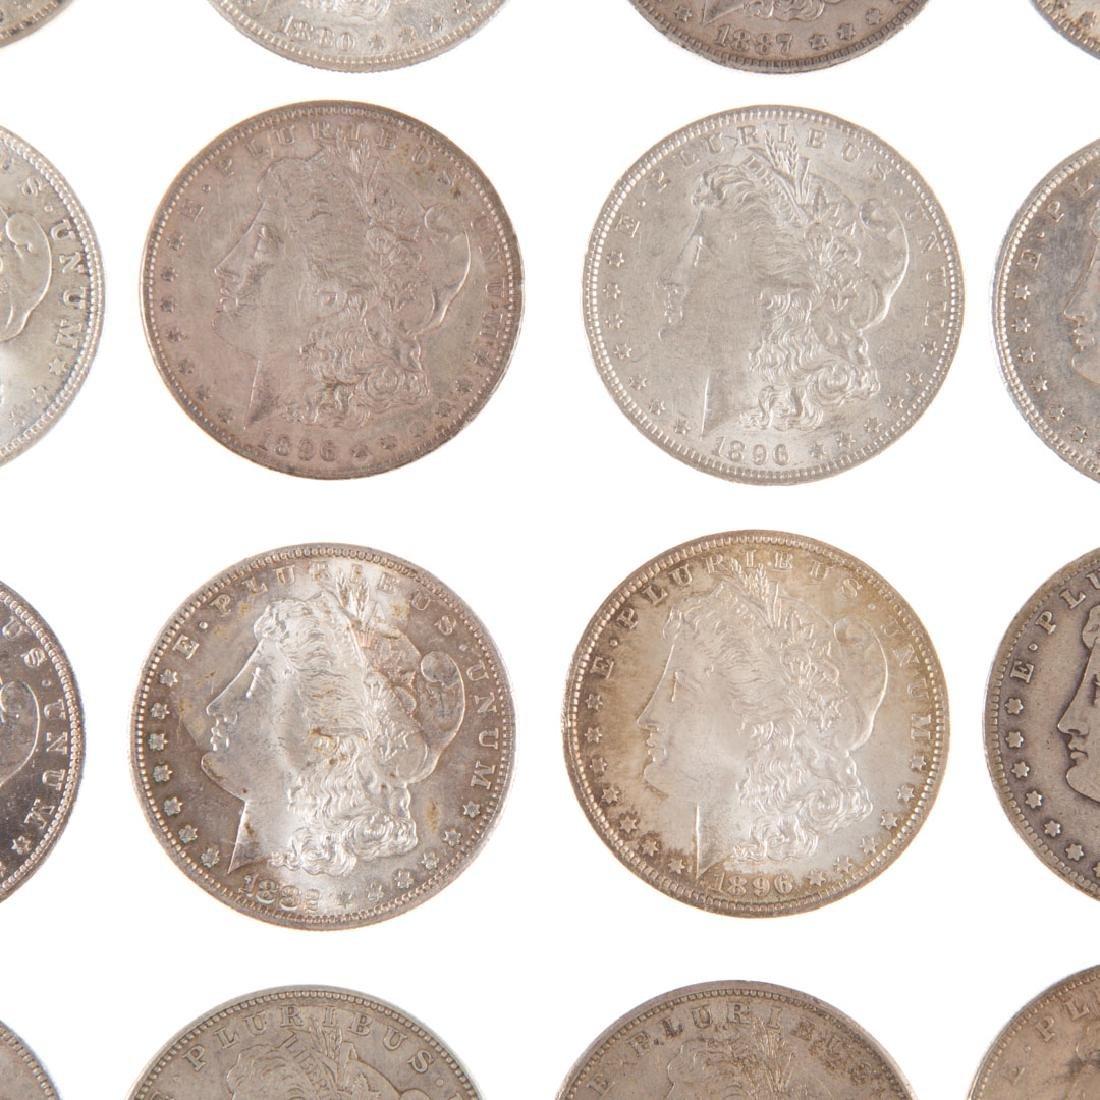 [US] Sixteen Morgan Silver Dollars - 2